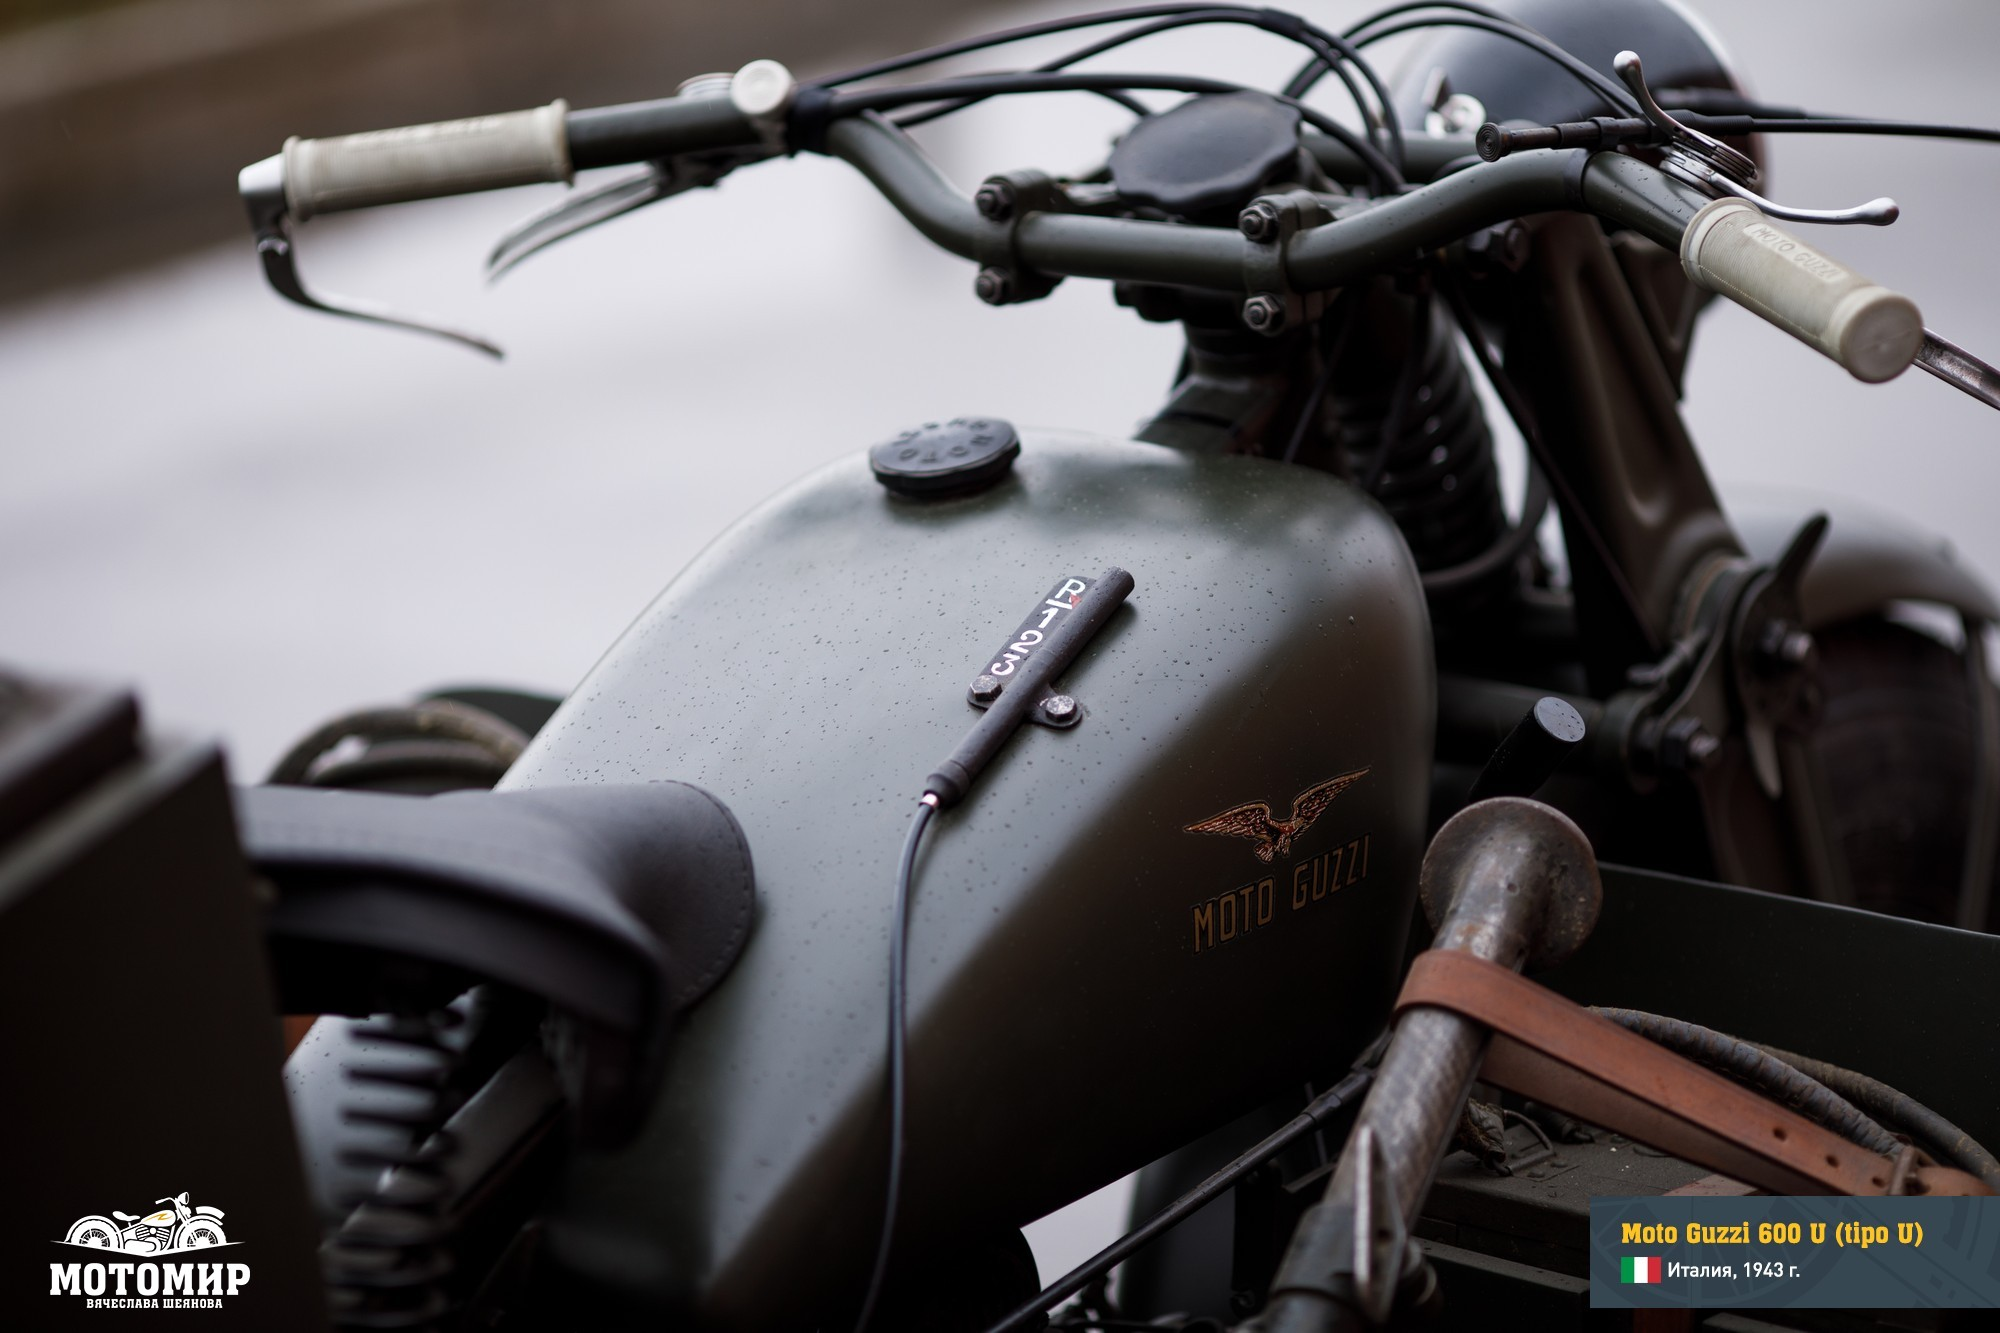 moto-guzzi-600-u-web-15